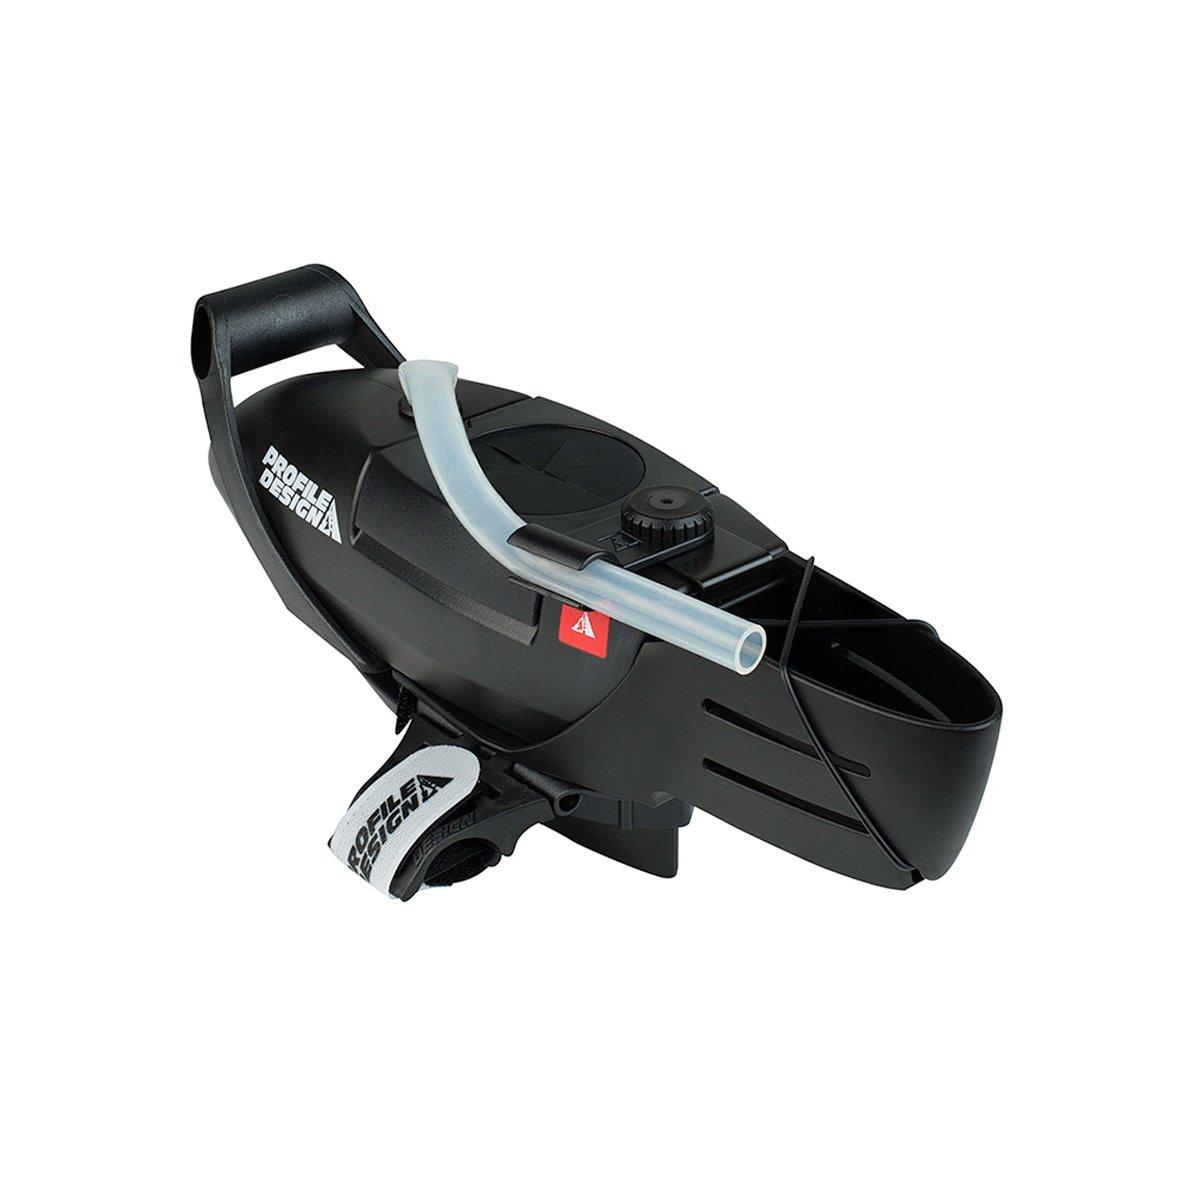 Profile Design FC25 Aero Triathlon Trinksystem